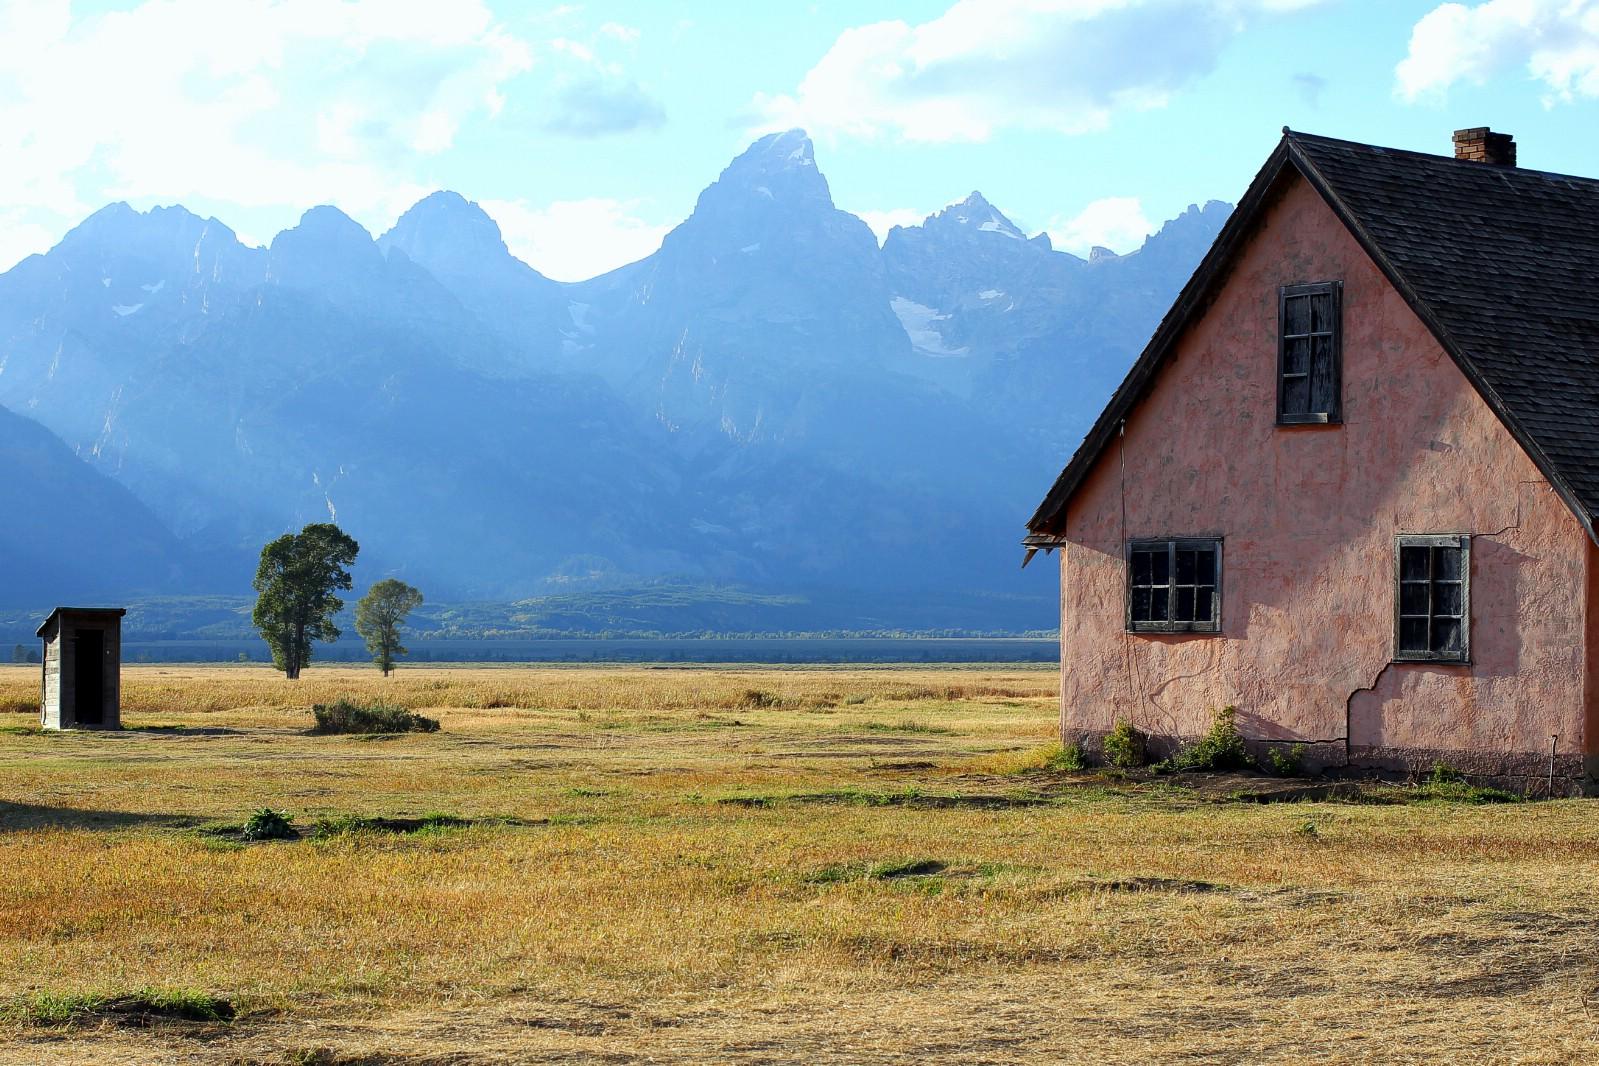 Buildings on Mormon Row in Grand Teton National Park, Wyoming, USA. September 5, 2016.